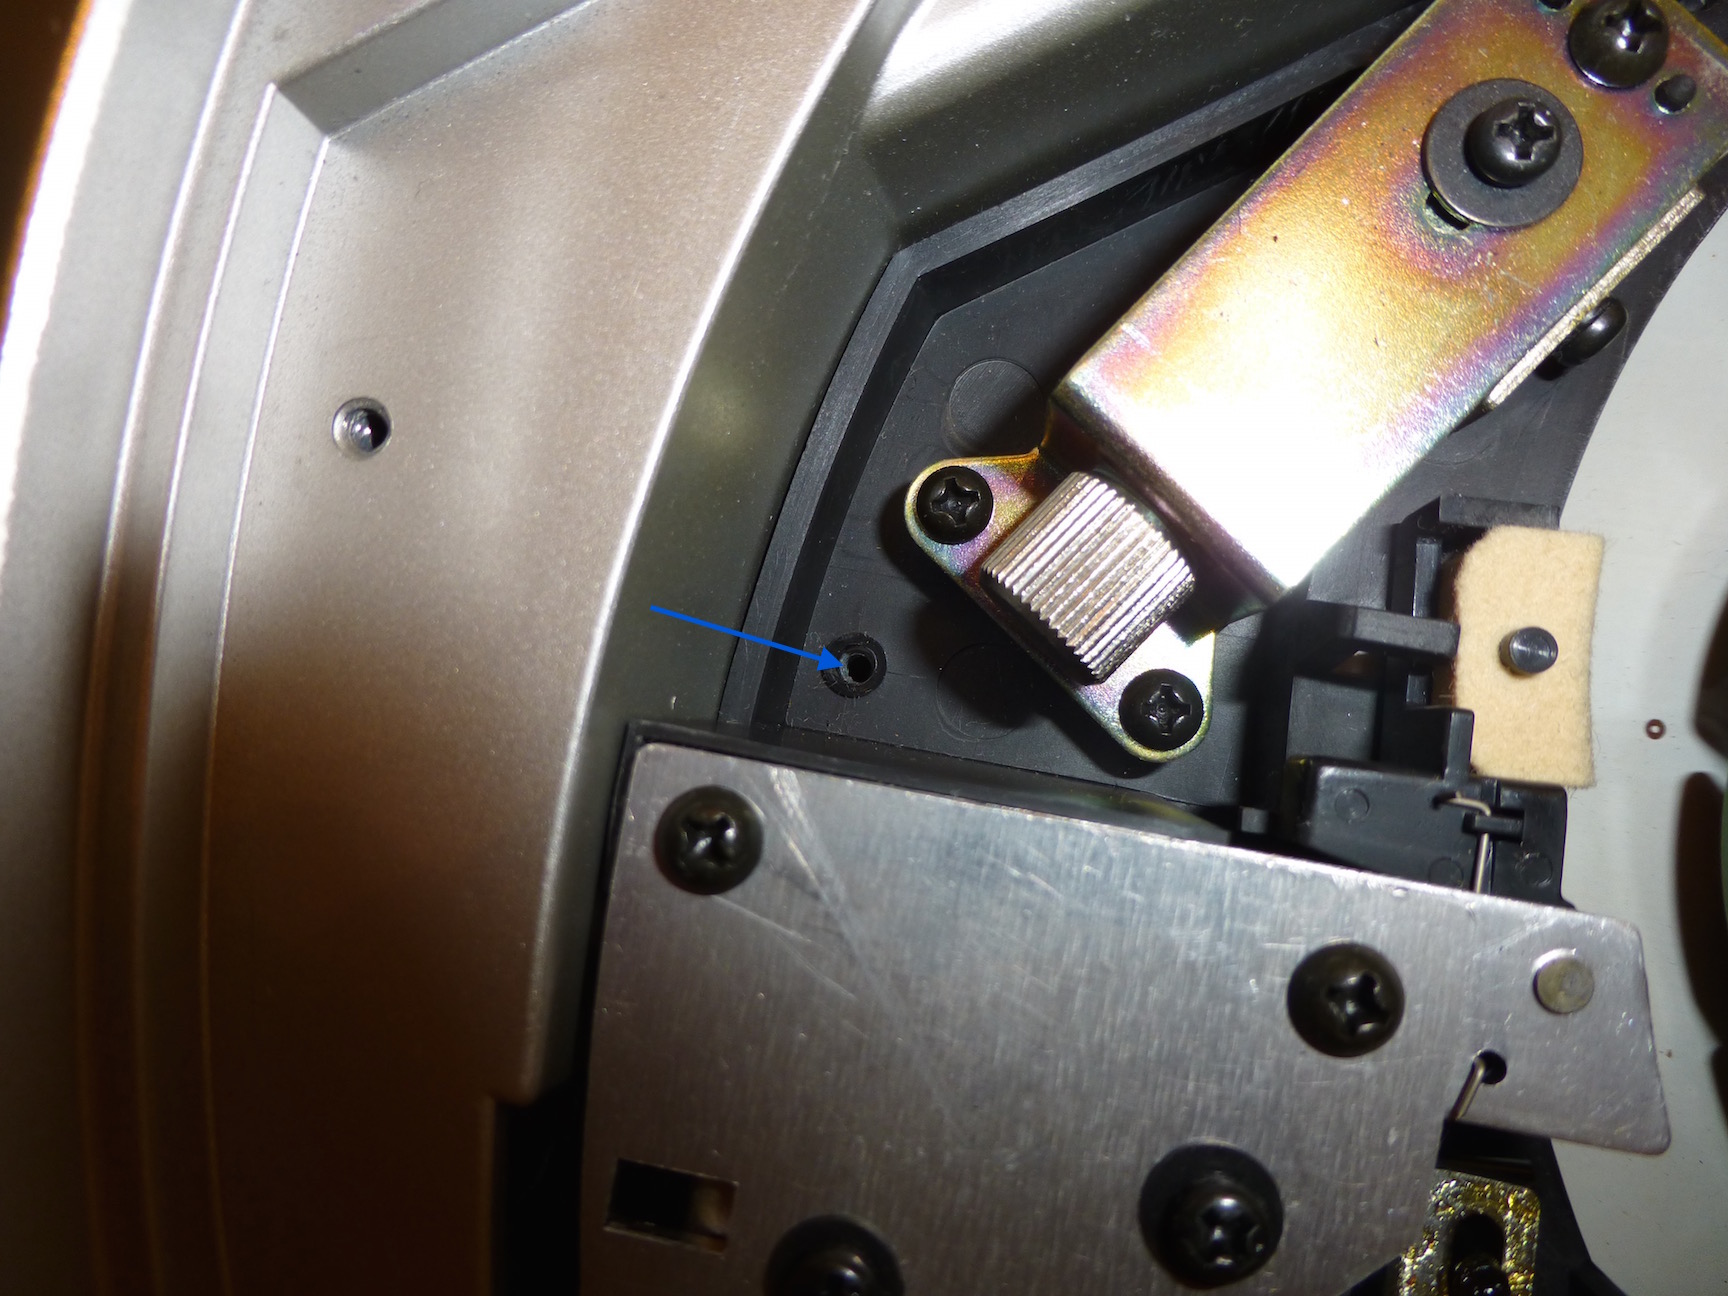 The Incredible Technics SP-10 MK3 Thread-p1010534-jpg